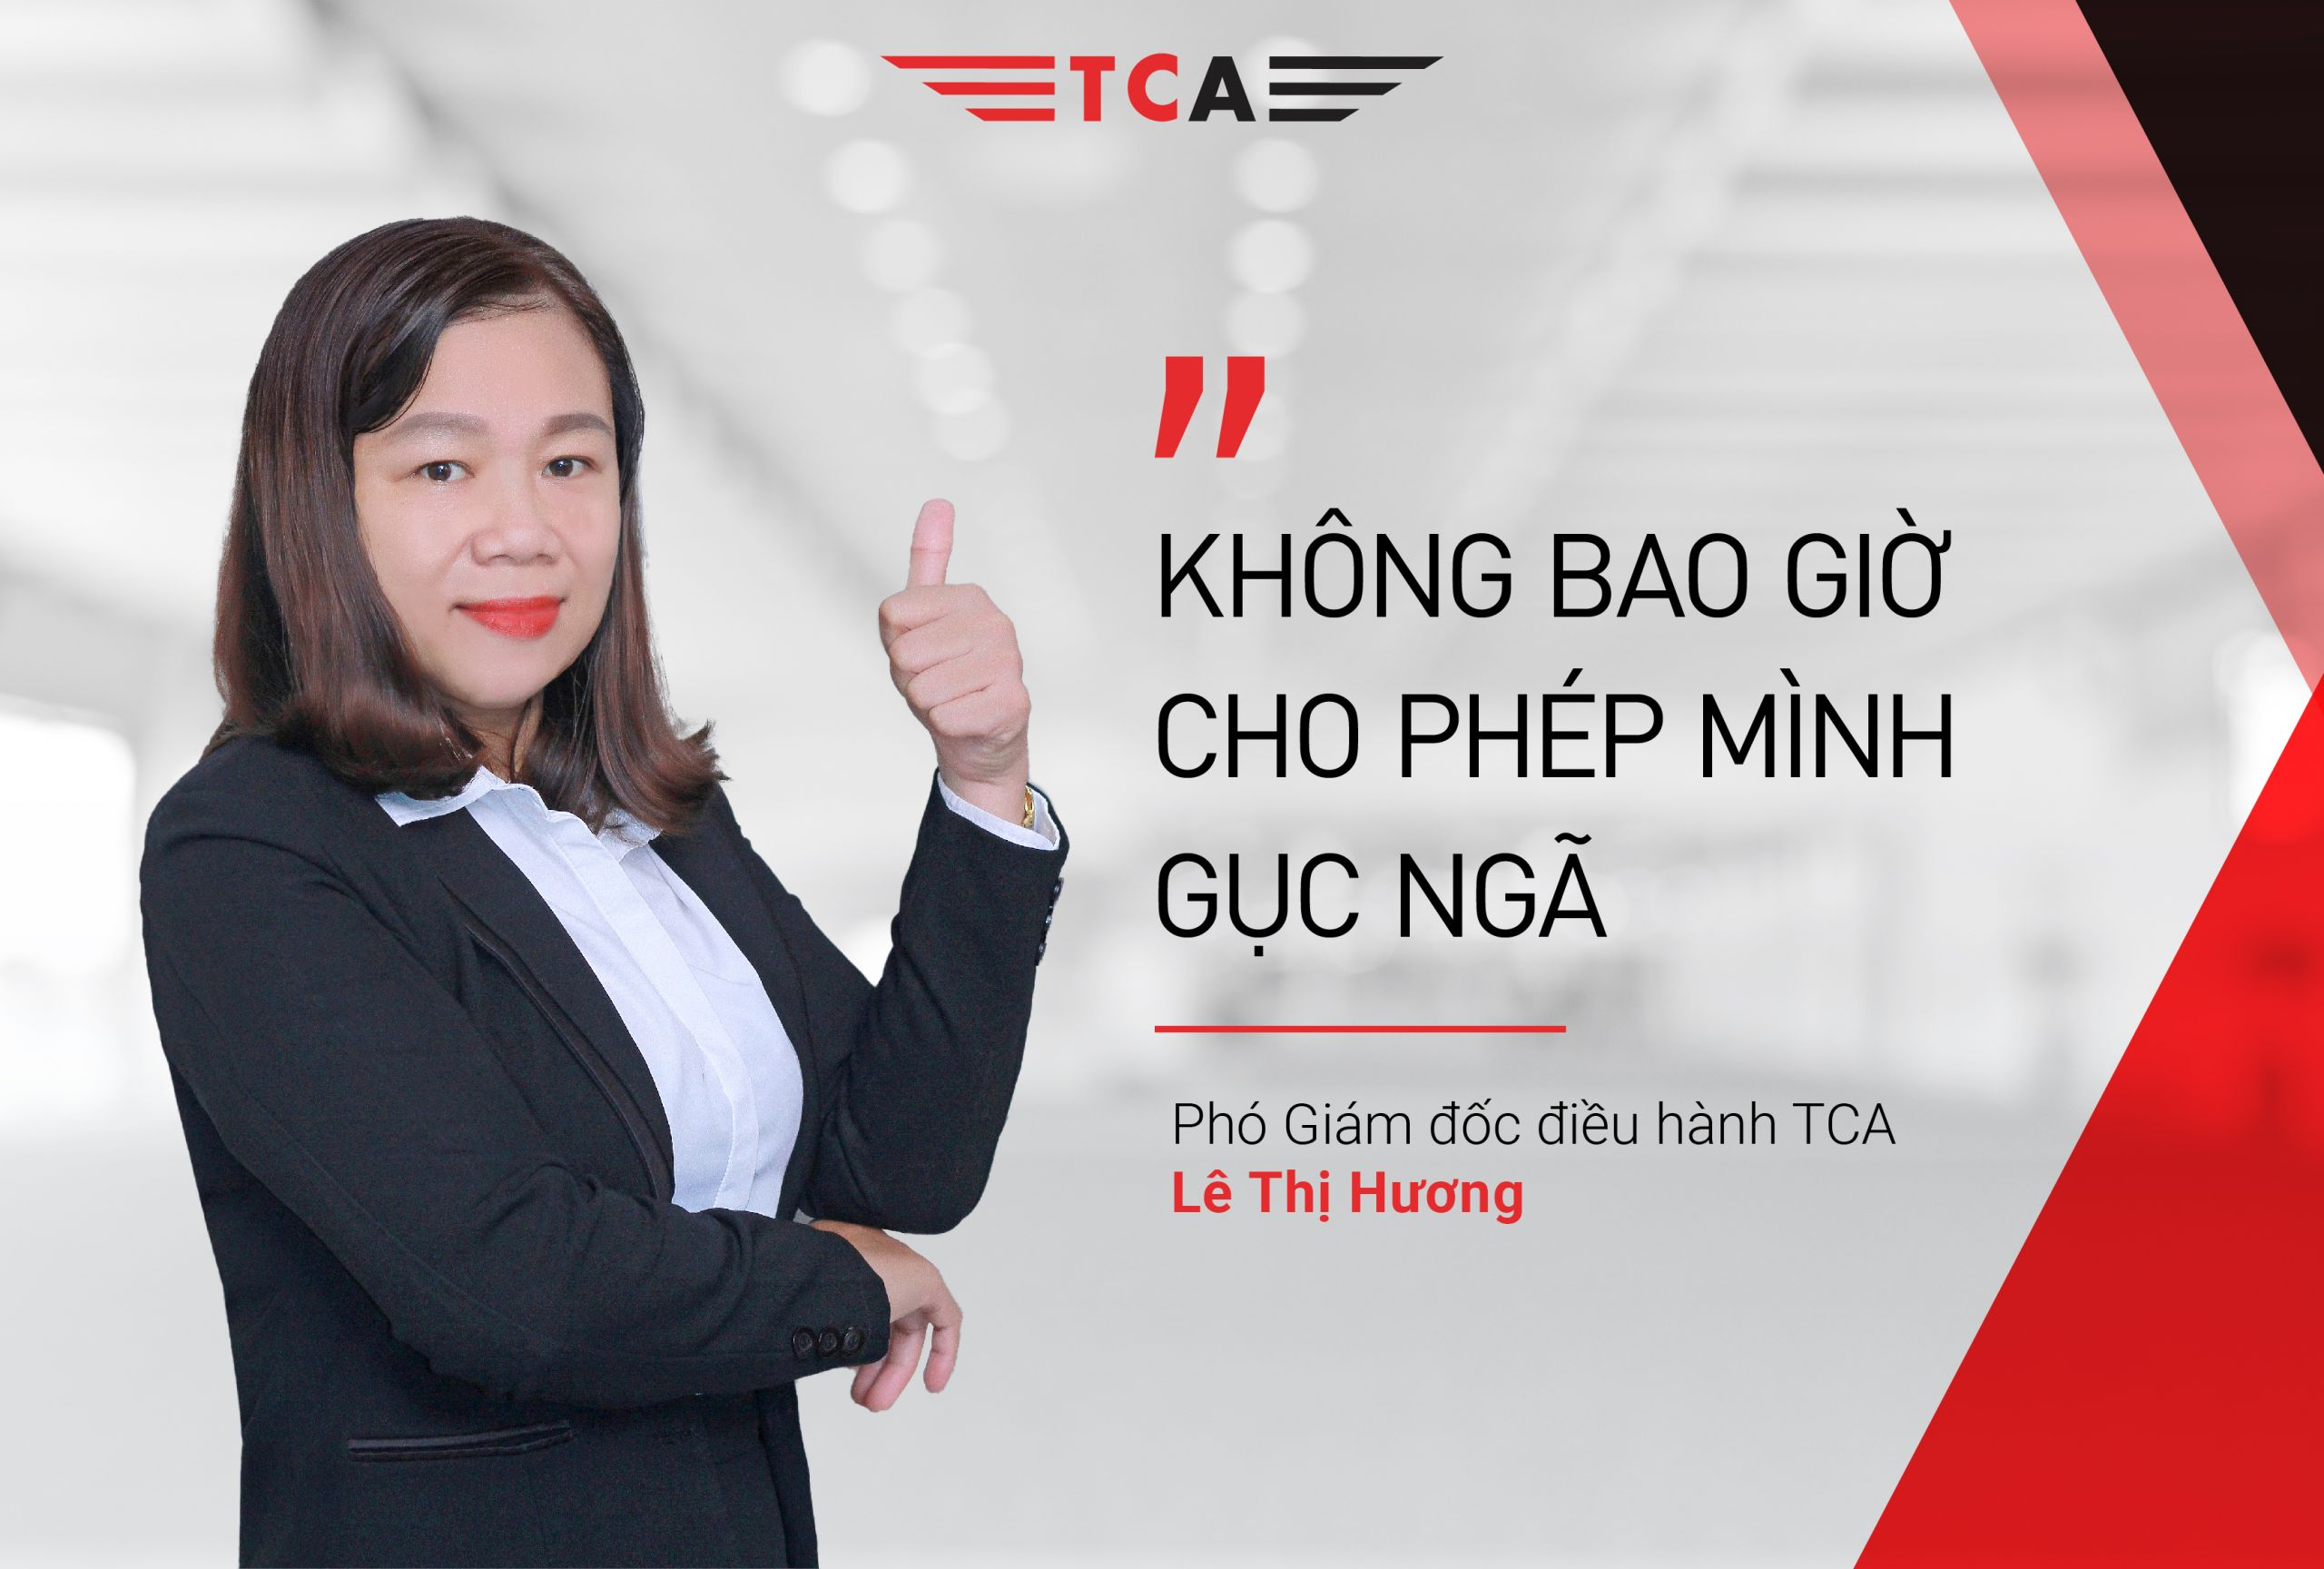 Le Thi Huong